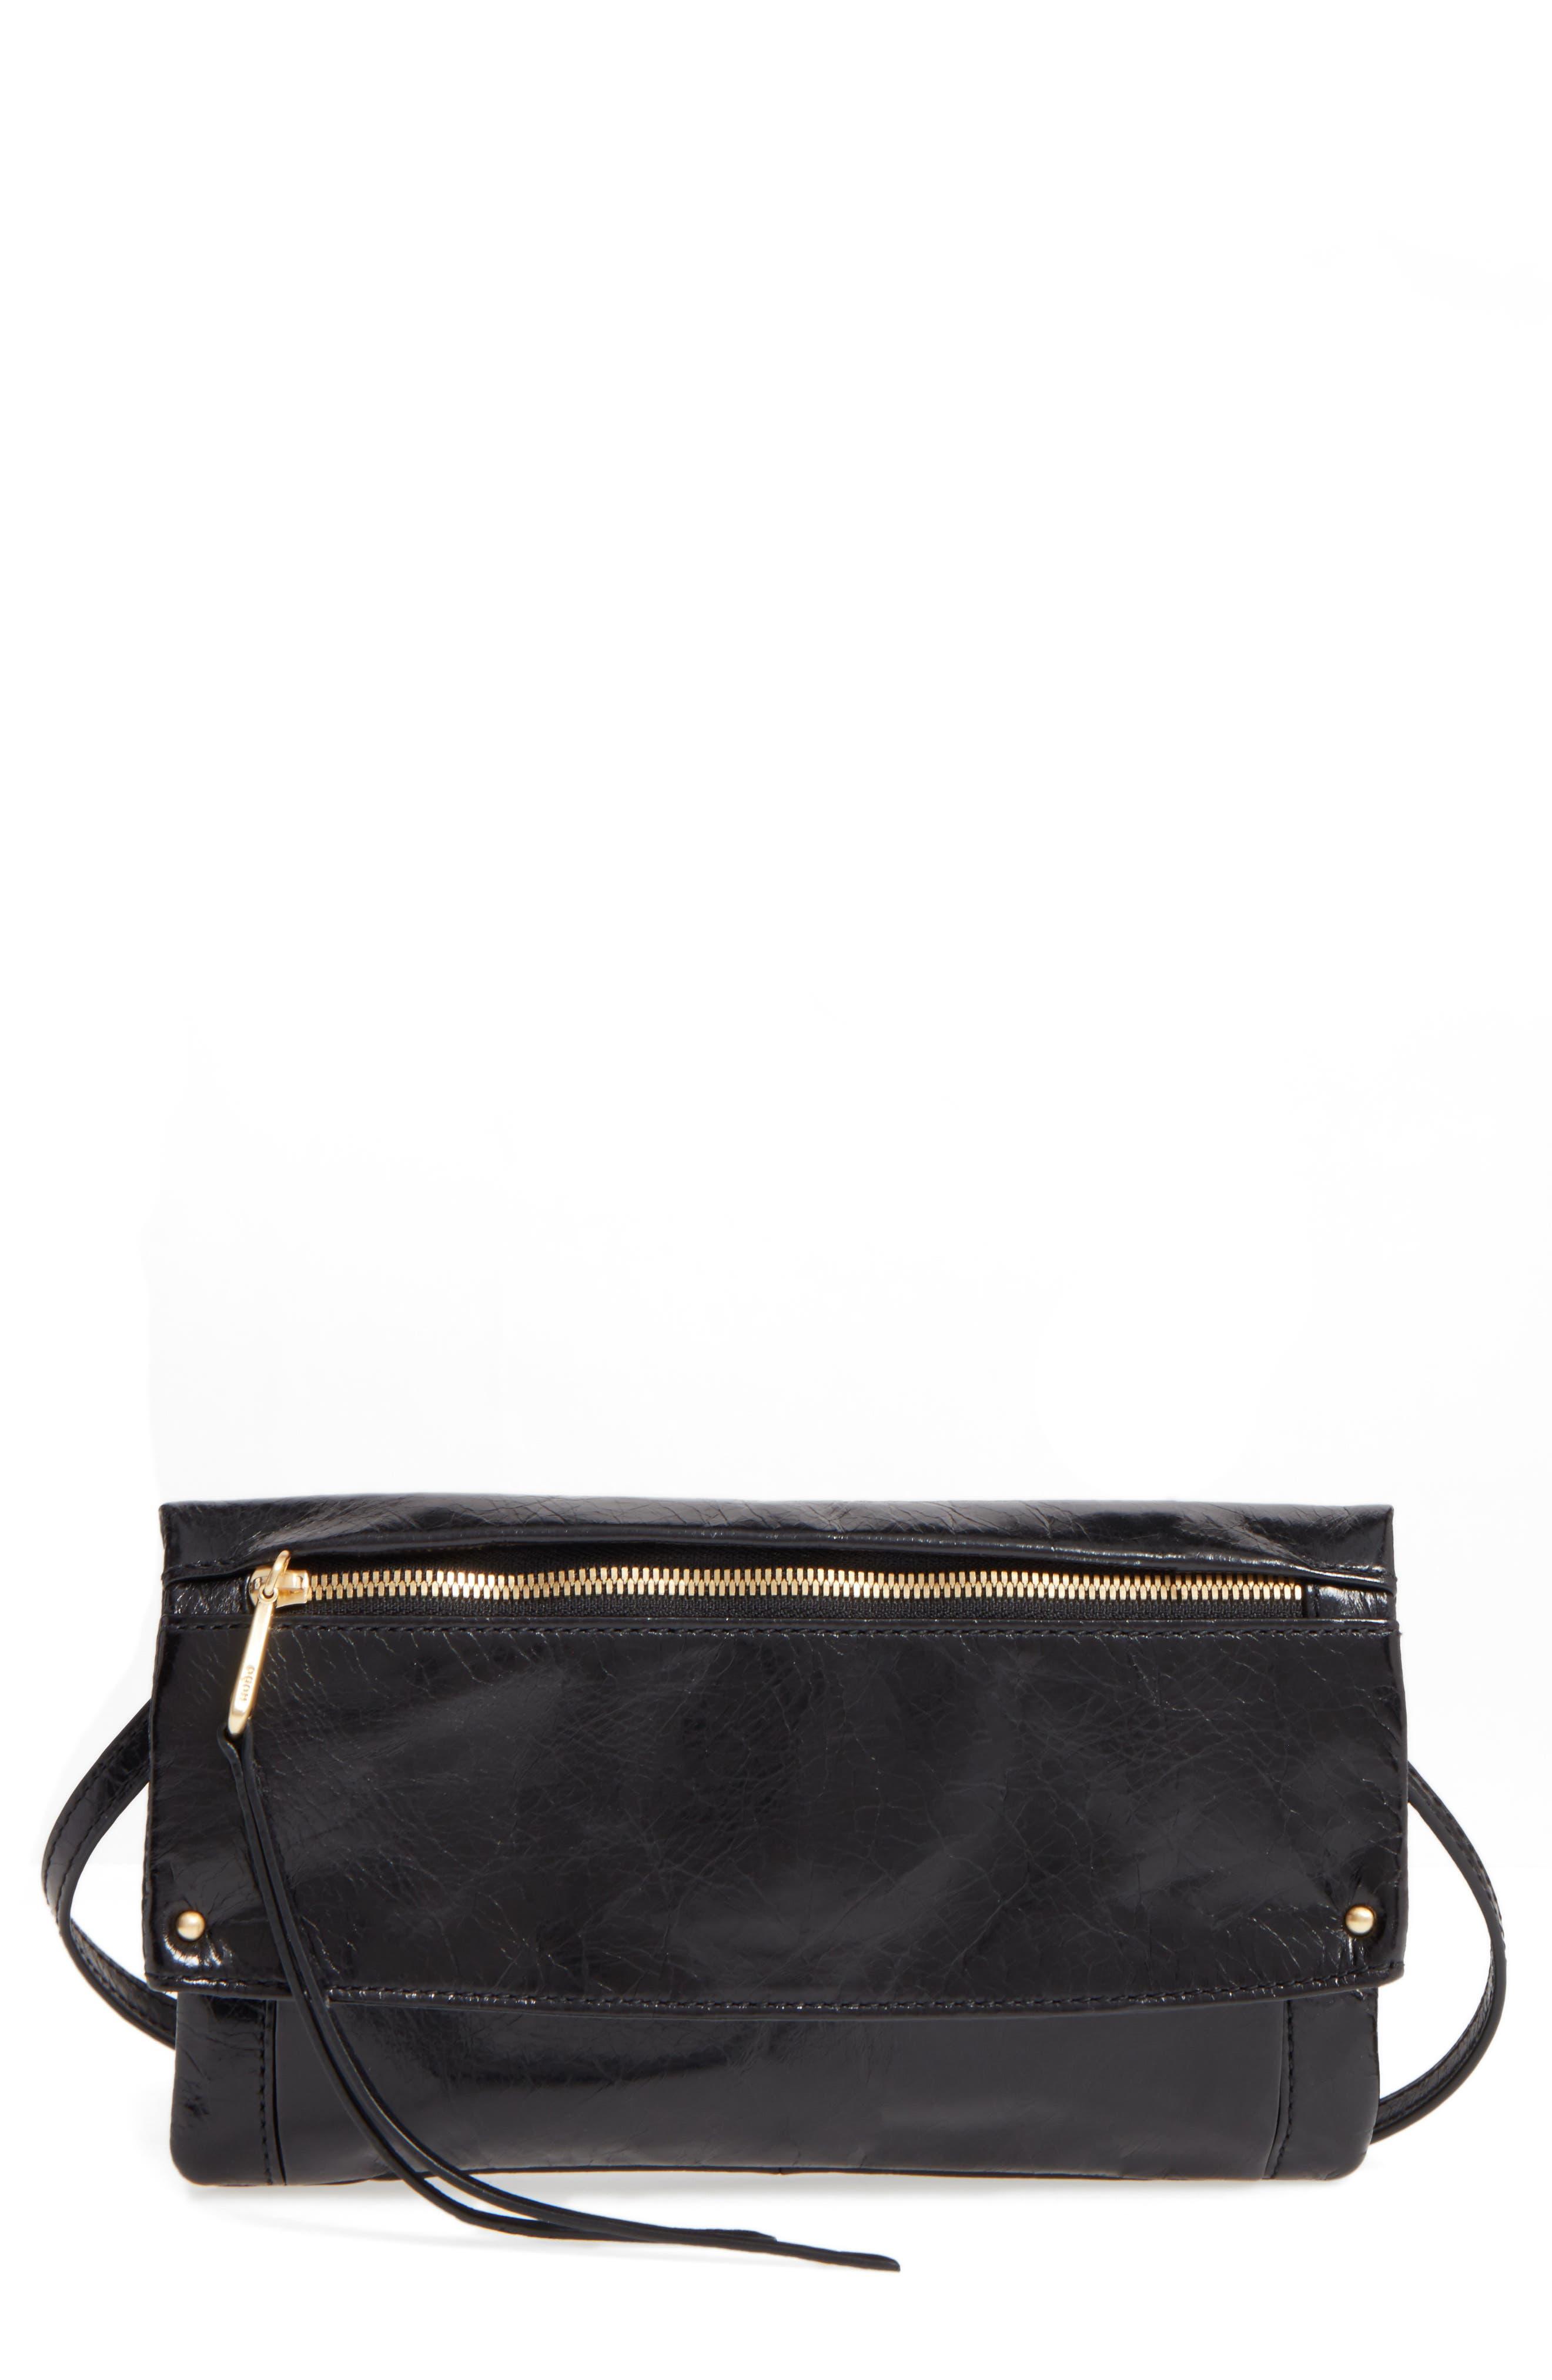 Rudy Leather Crossbody Bag,                             Alternate thumbnail 2, color,                             001